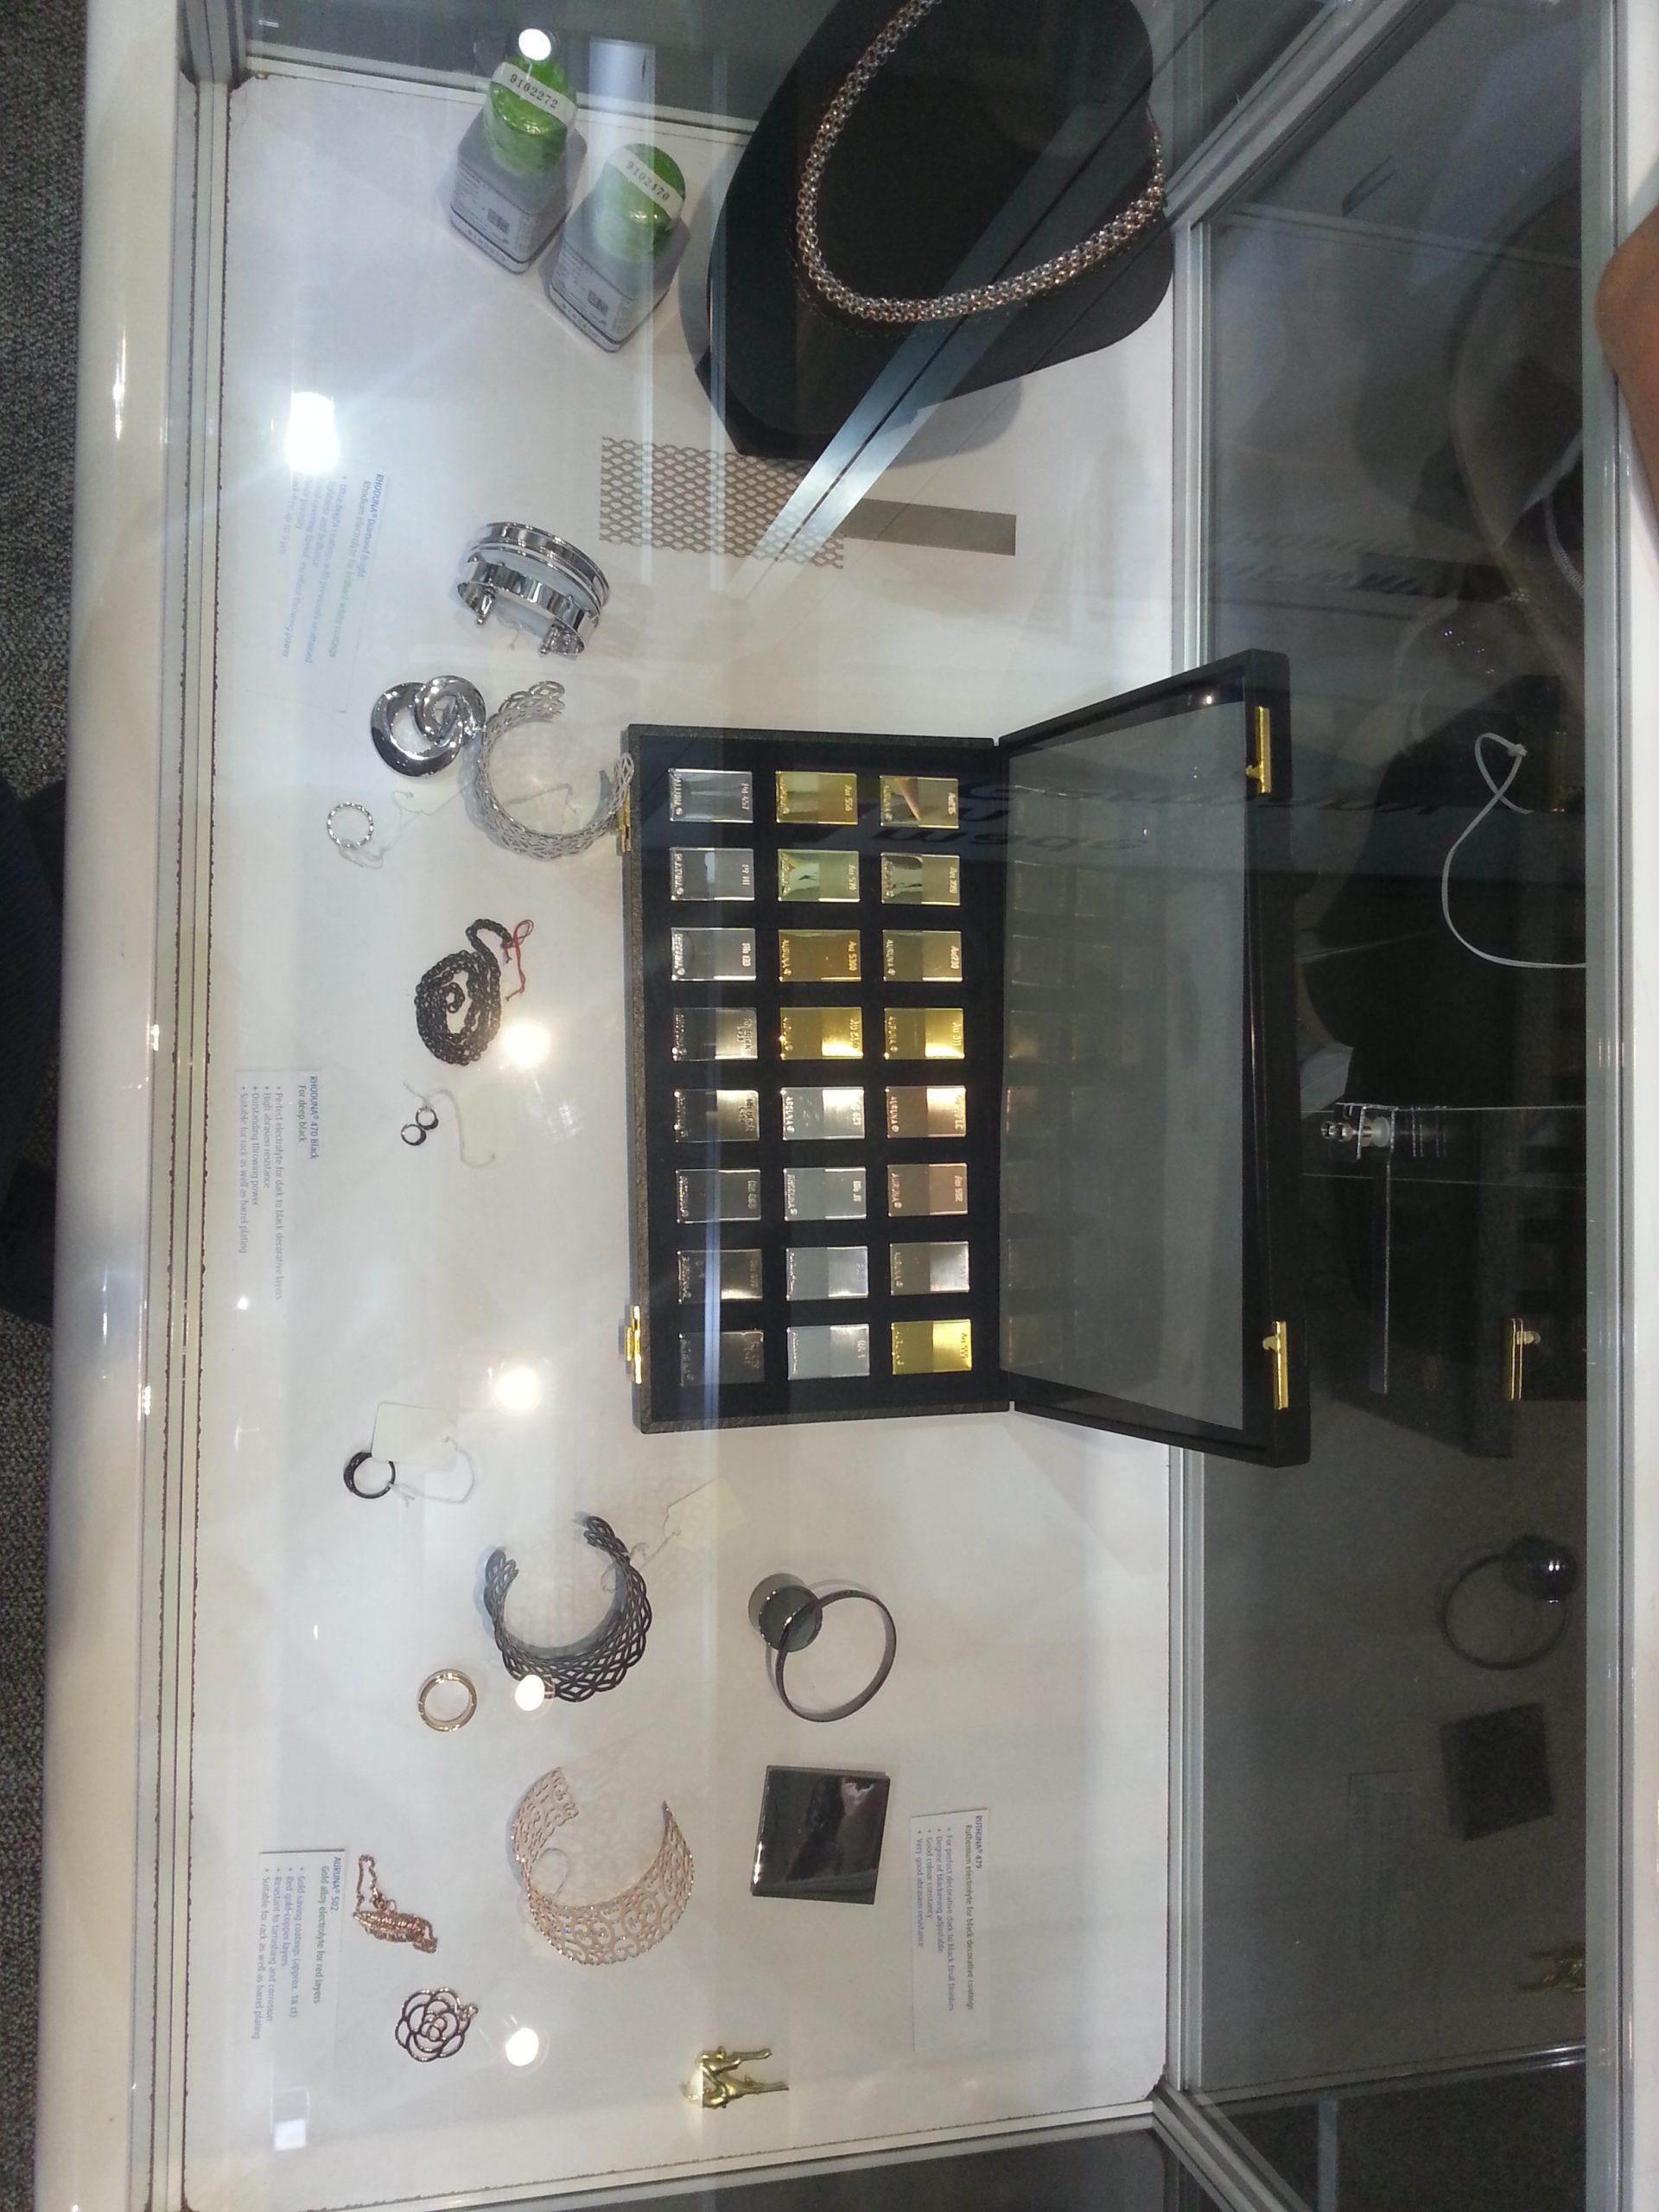 Jewellery-Net-Asia-Show-Hong-Kong-15-18-Sep-2016-Umicore-Display-3